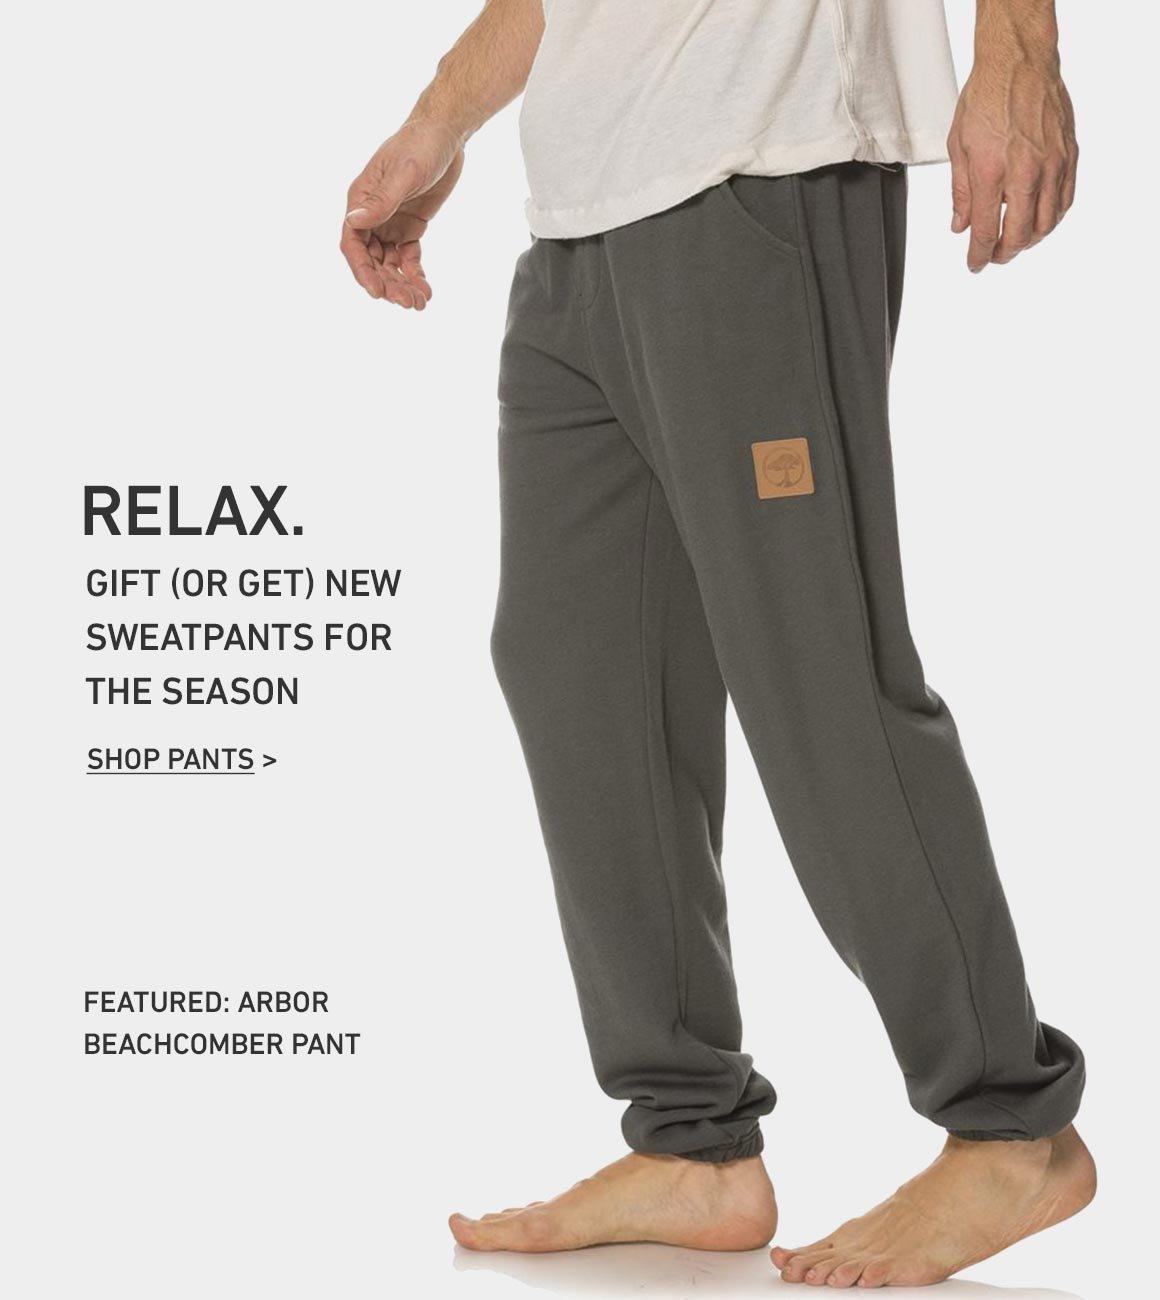 Shop New Sweatpants